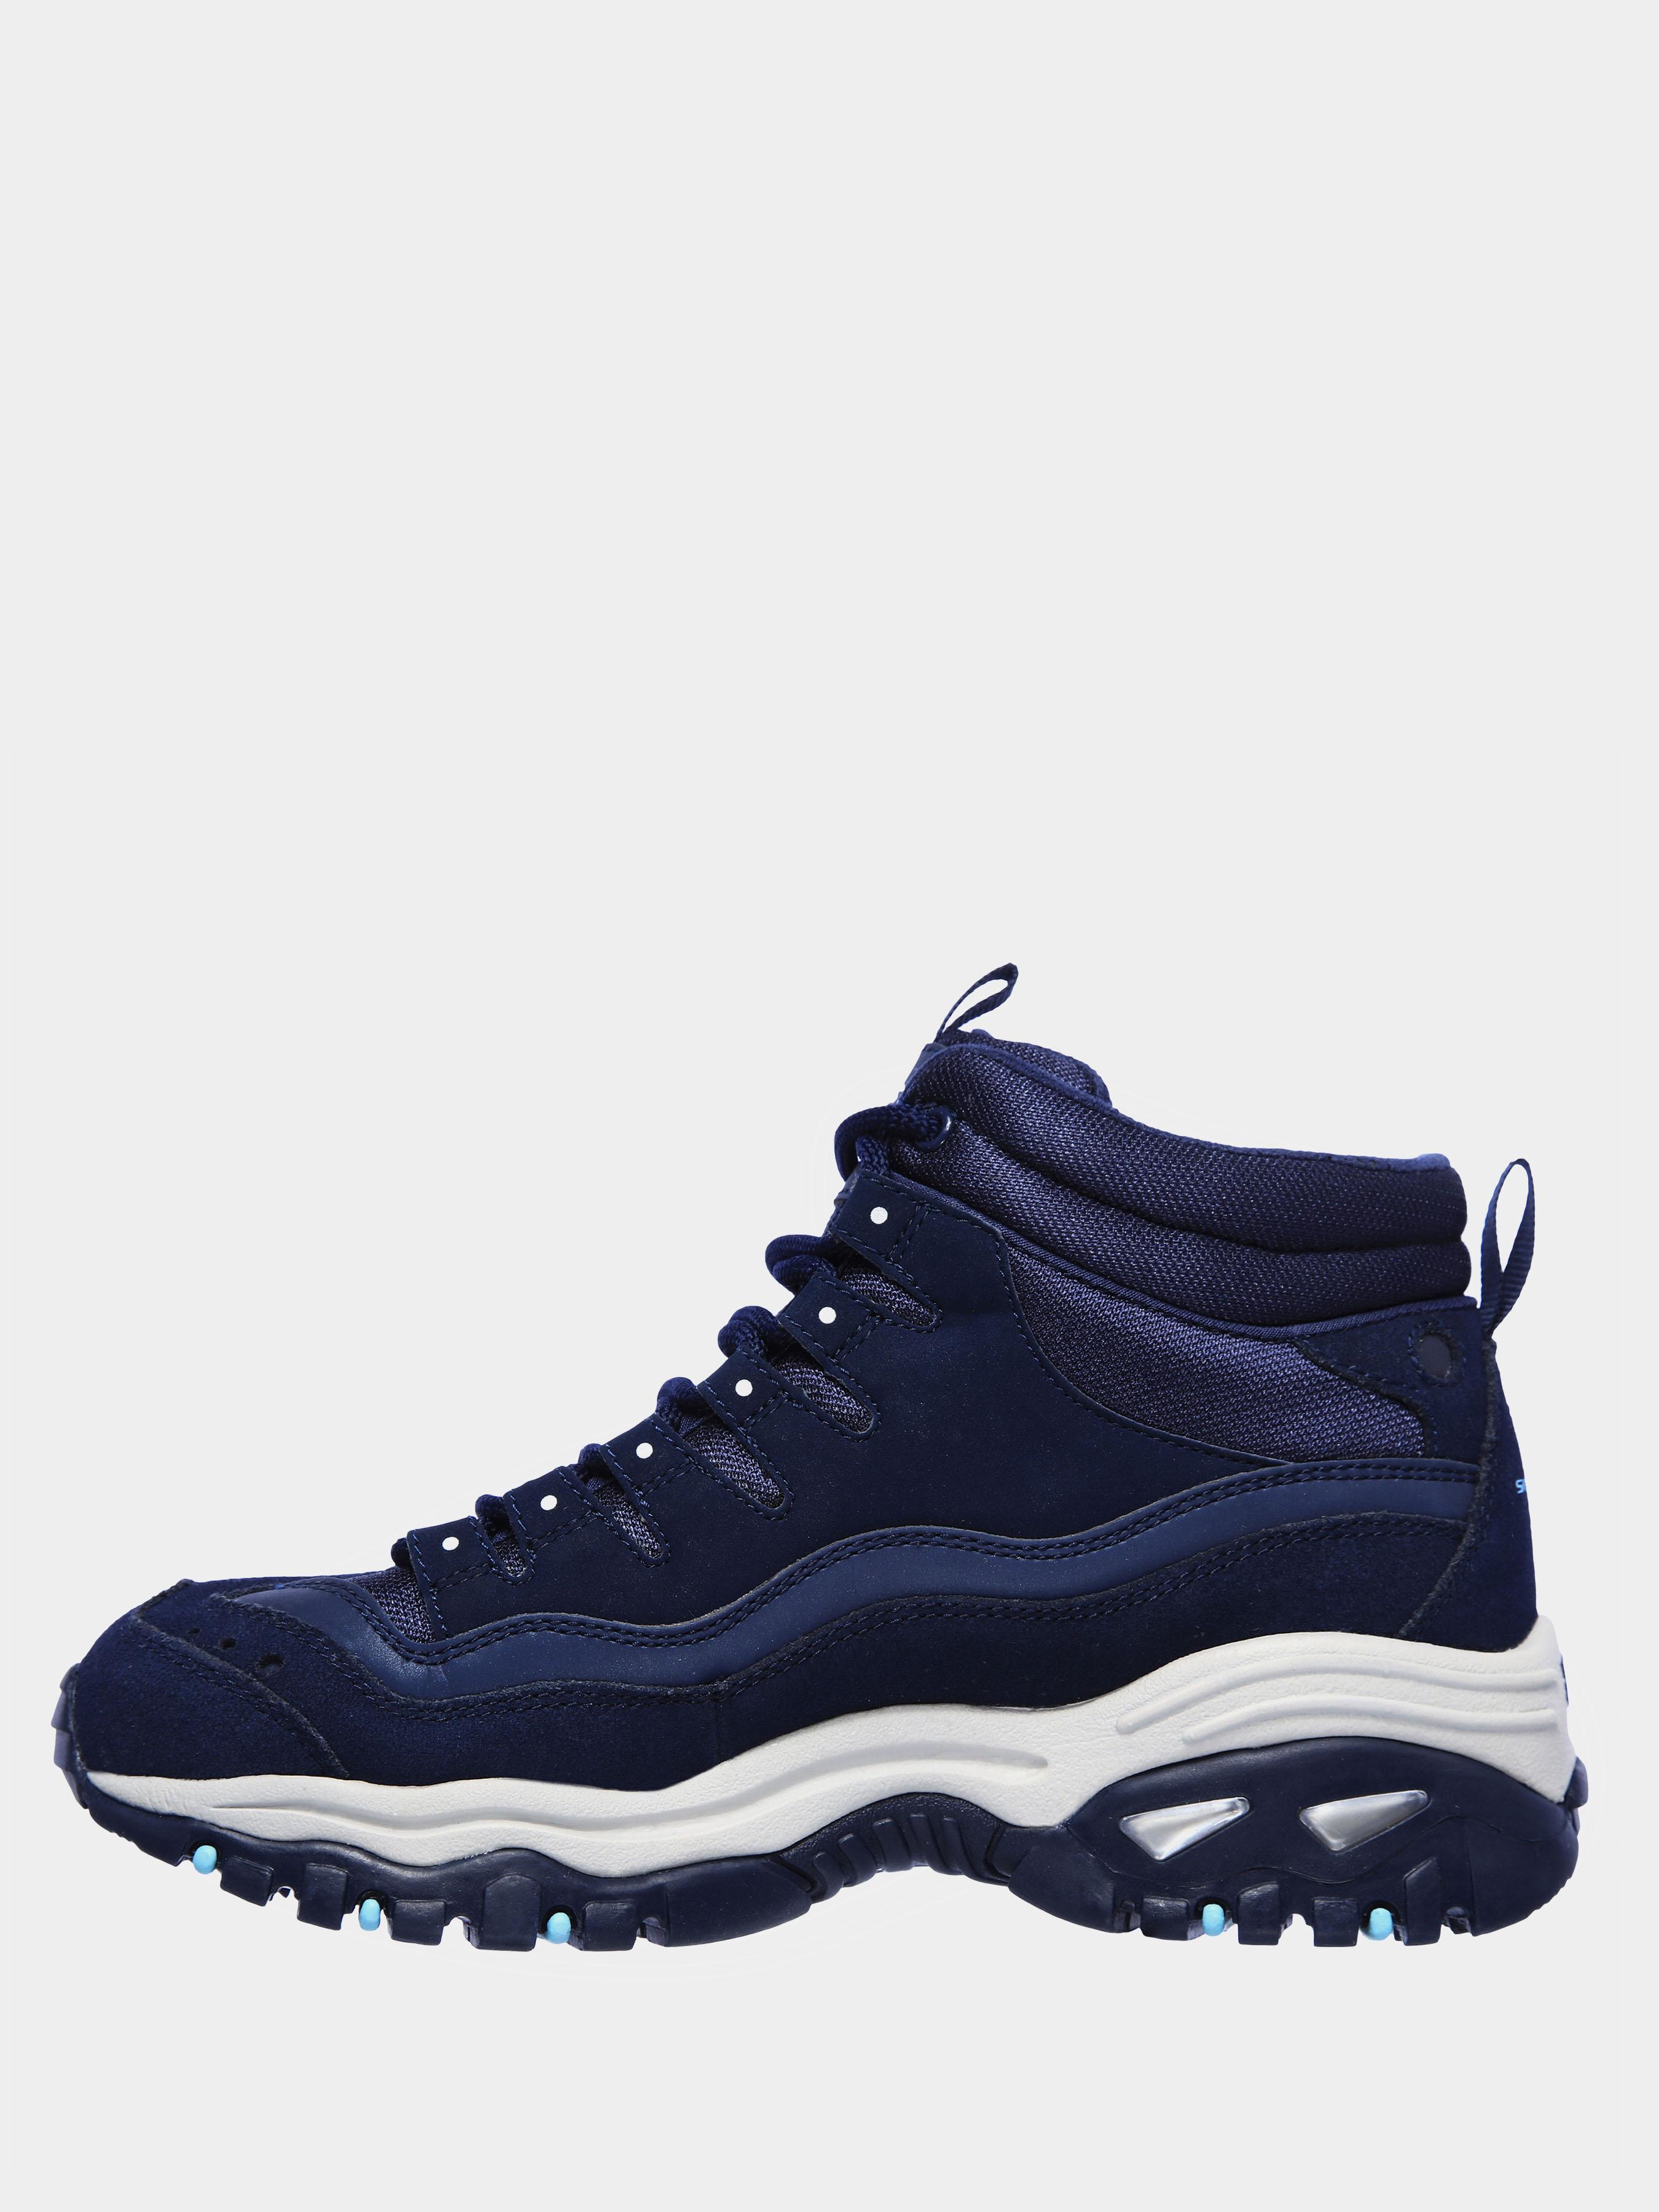 Ботинки для женщин Skechers KW5273 размеры обуви, 2017